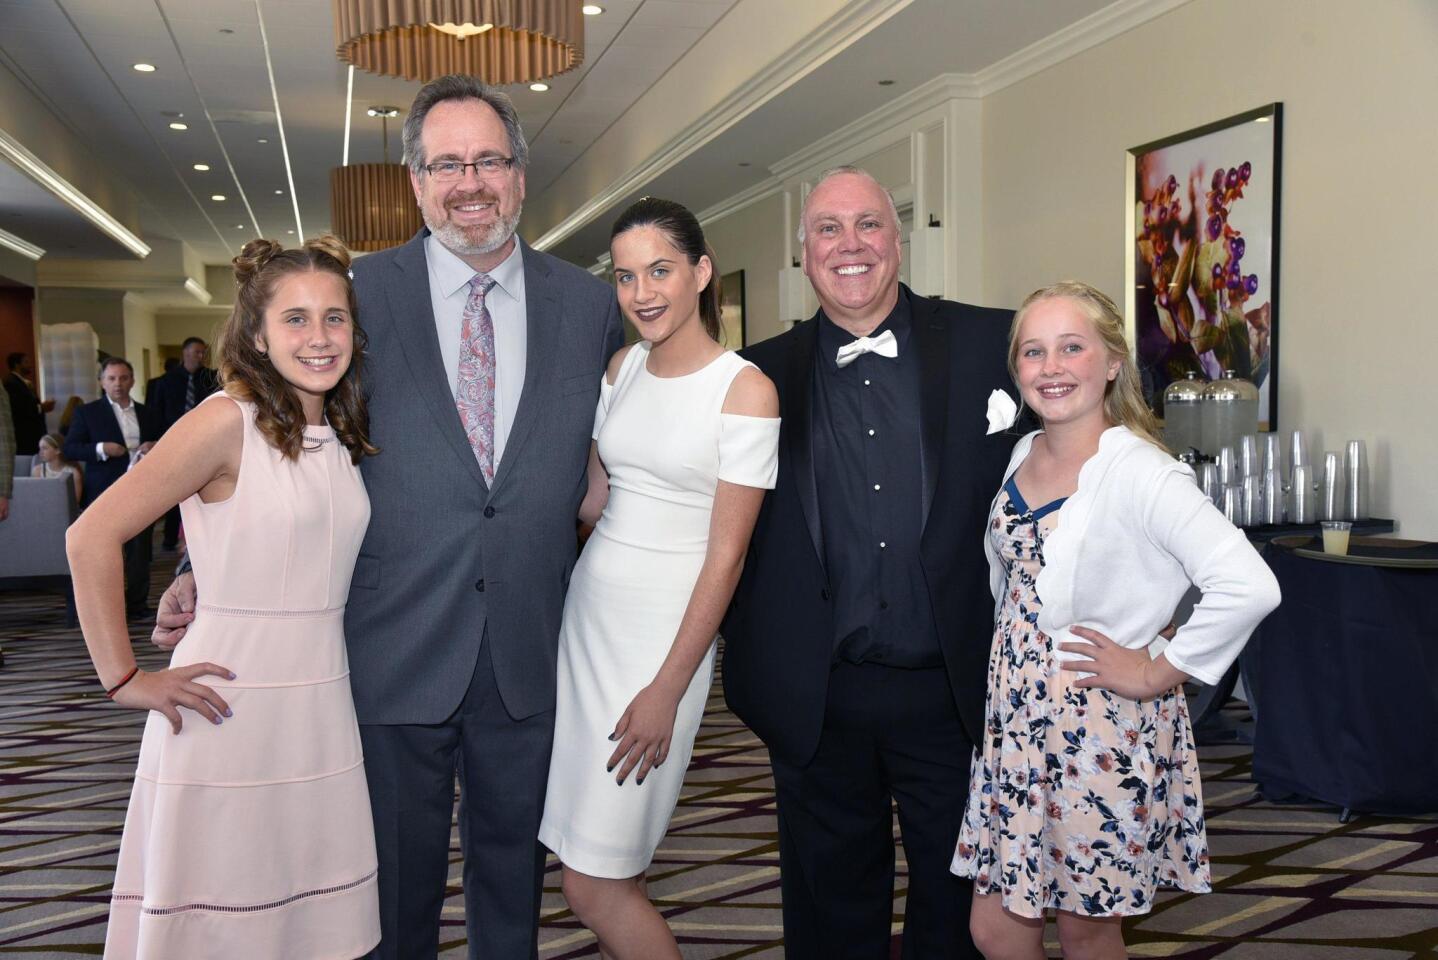 'Girls of Solana Santa Fe Father Daughter Dance'